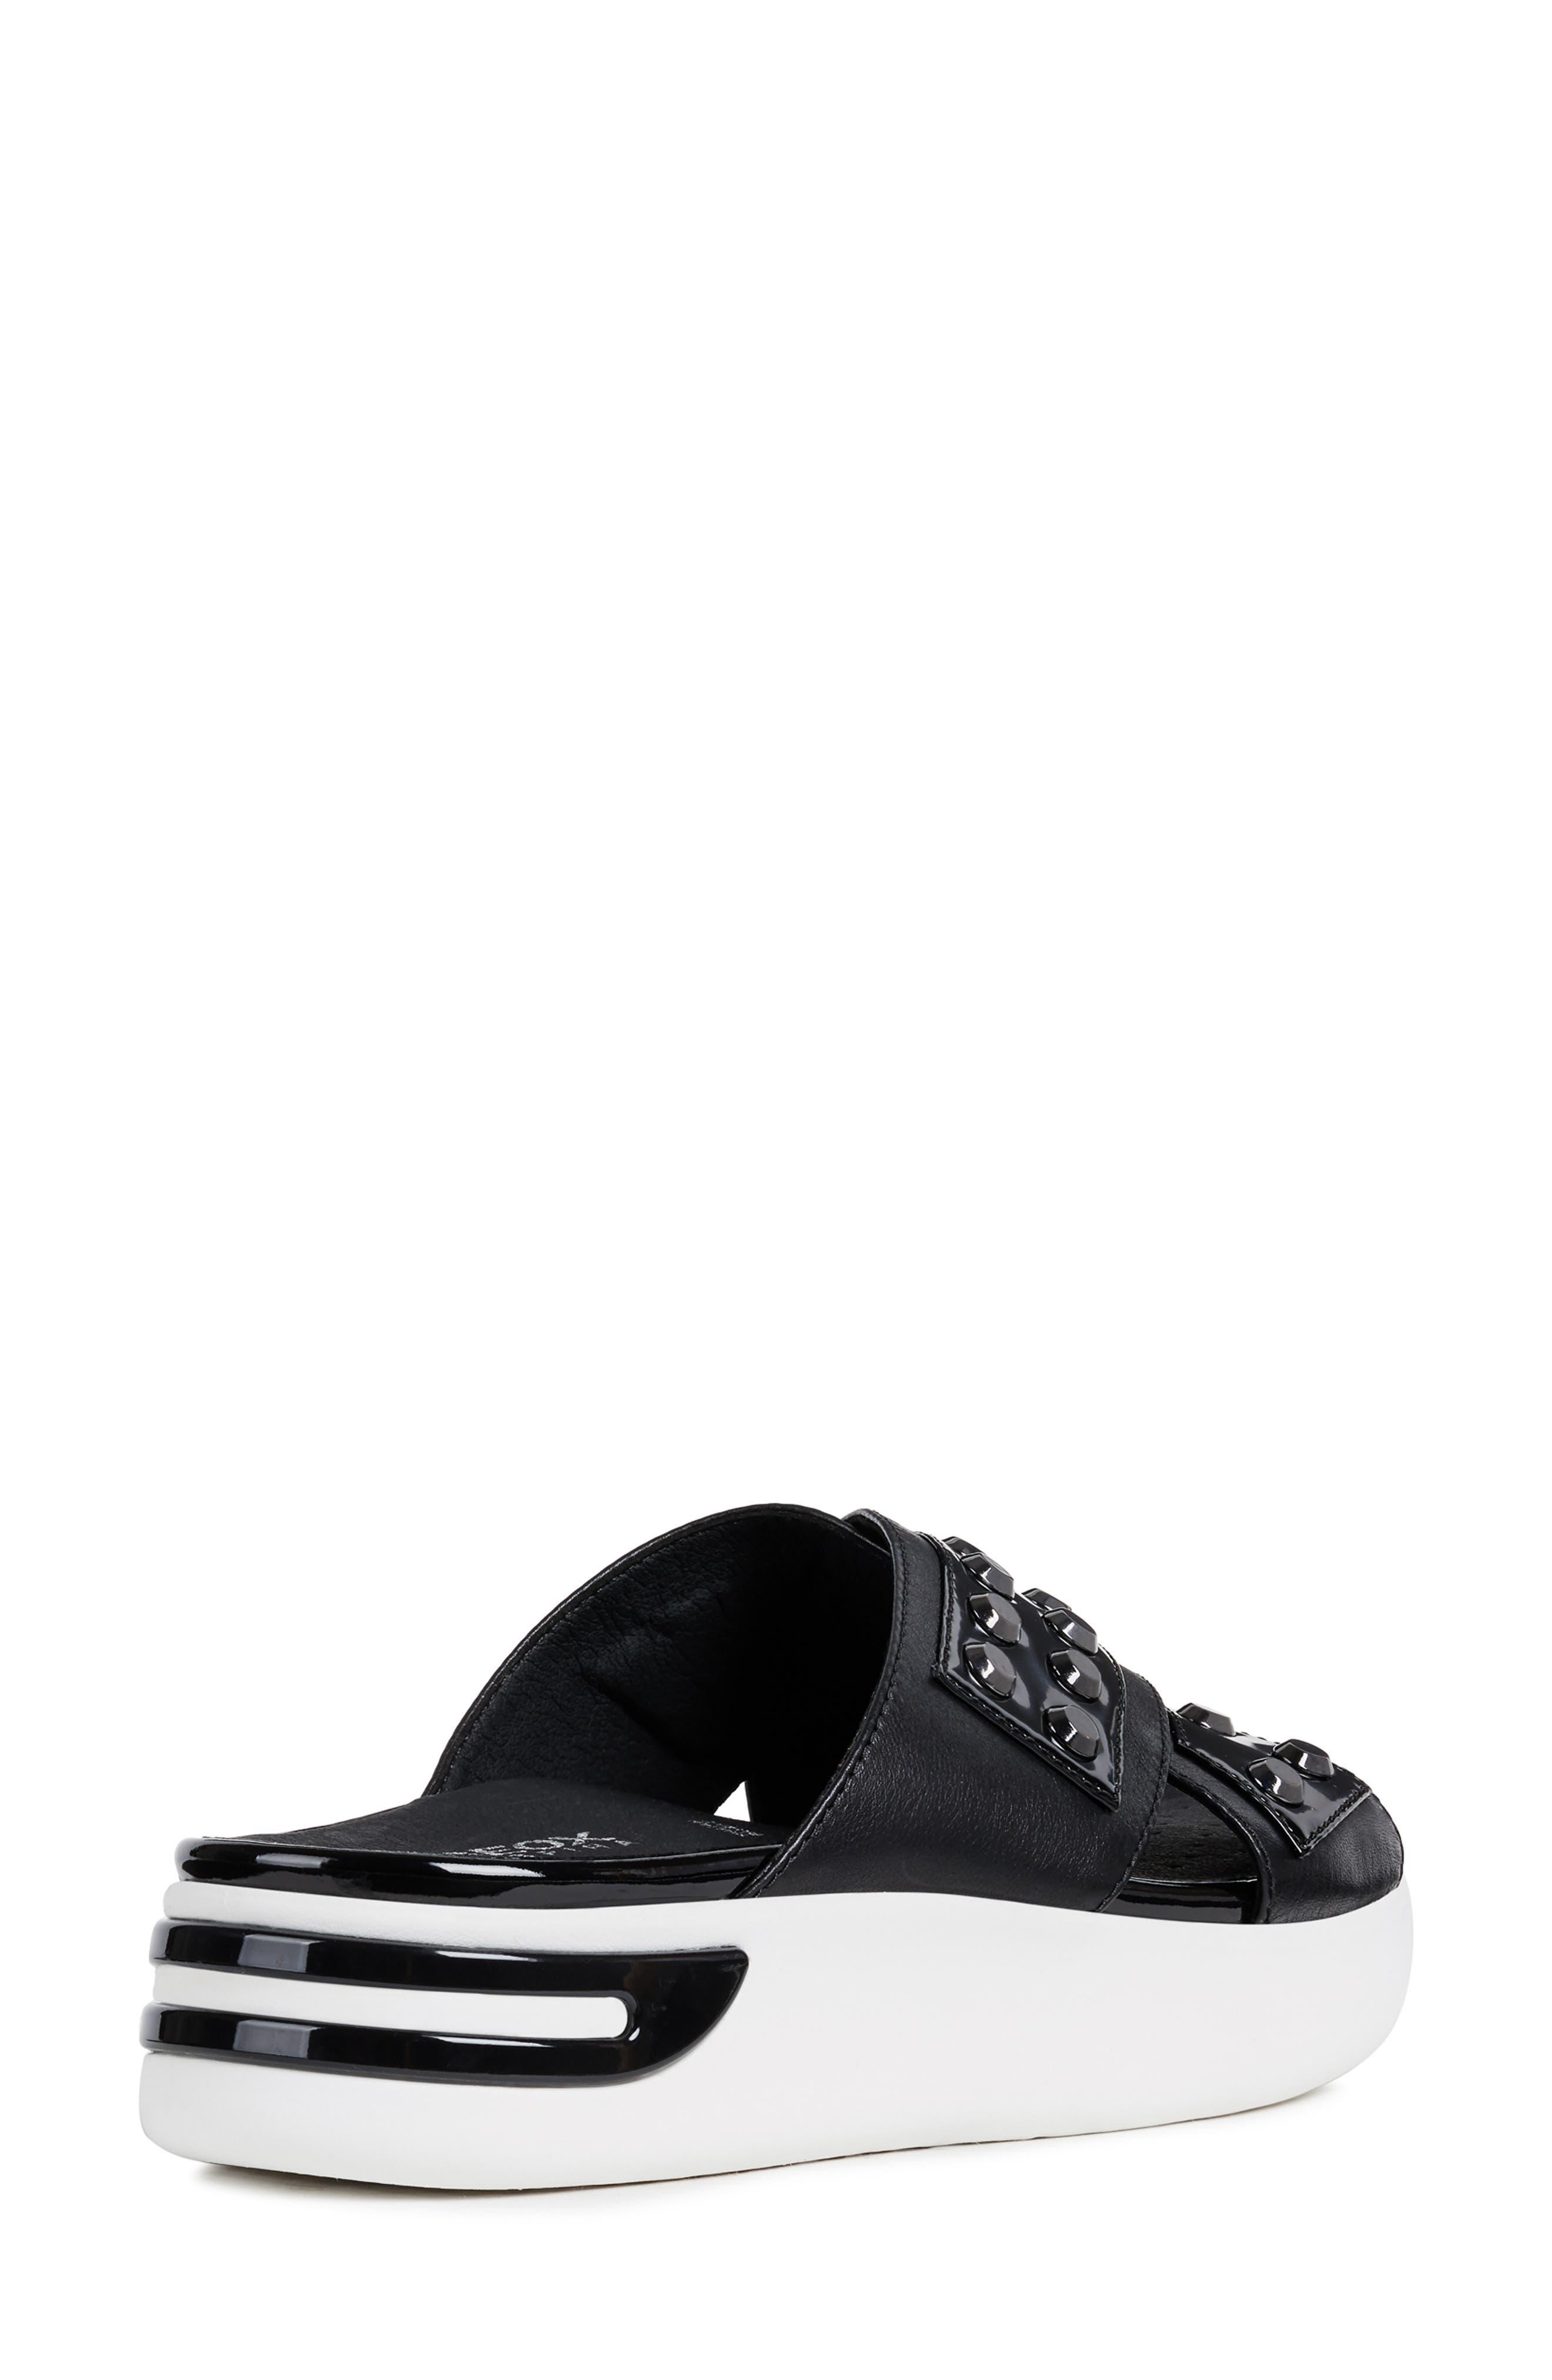 GEOX, Ottaya Studded Slide Sandal, Alternate thumbnail 7, color, BLACK LEATHER